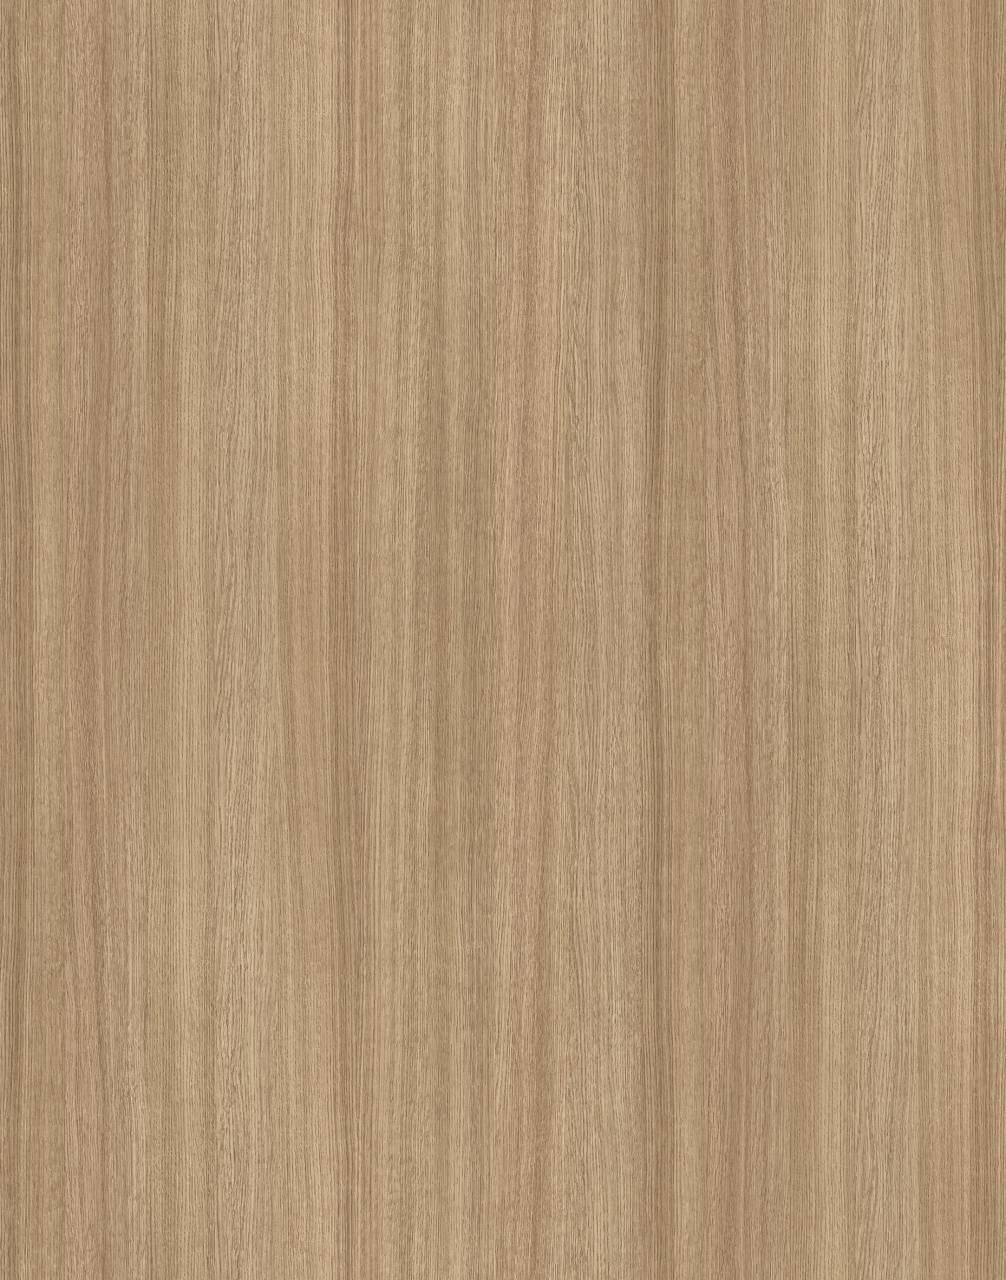 5501 Slavonia Oak (MF PB sample)